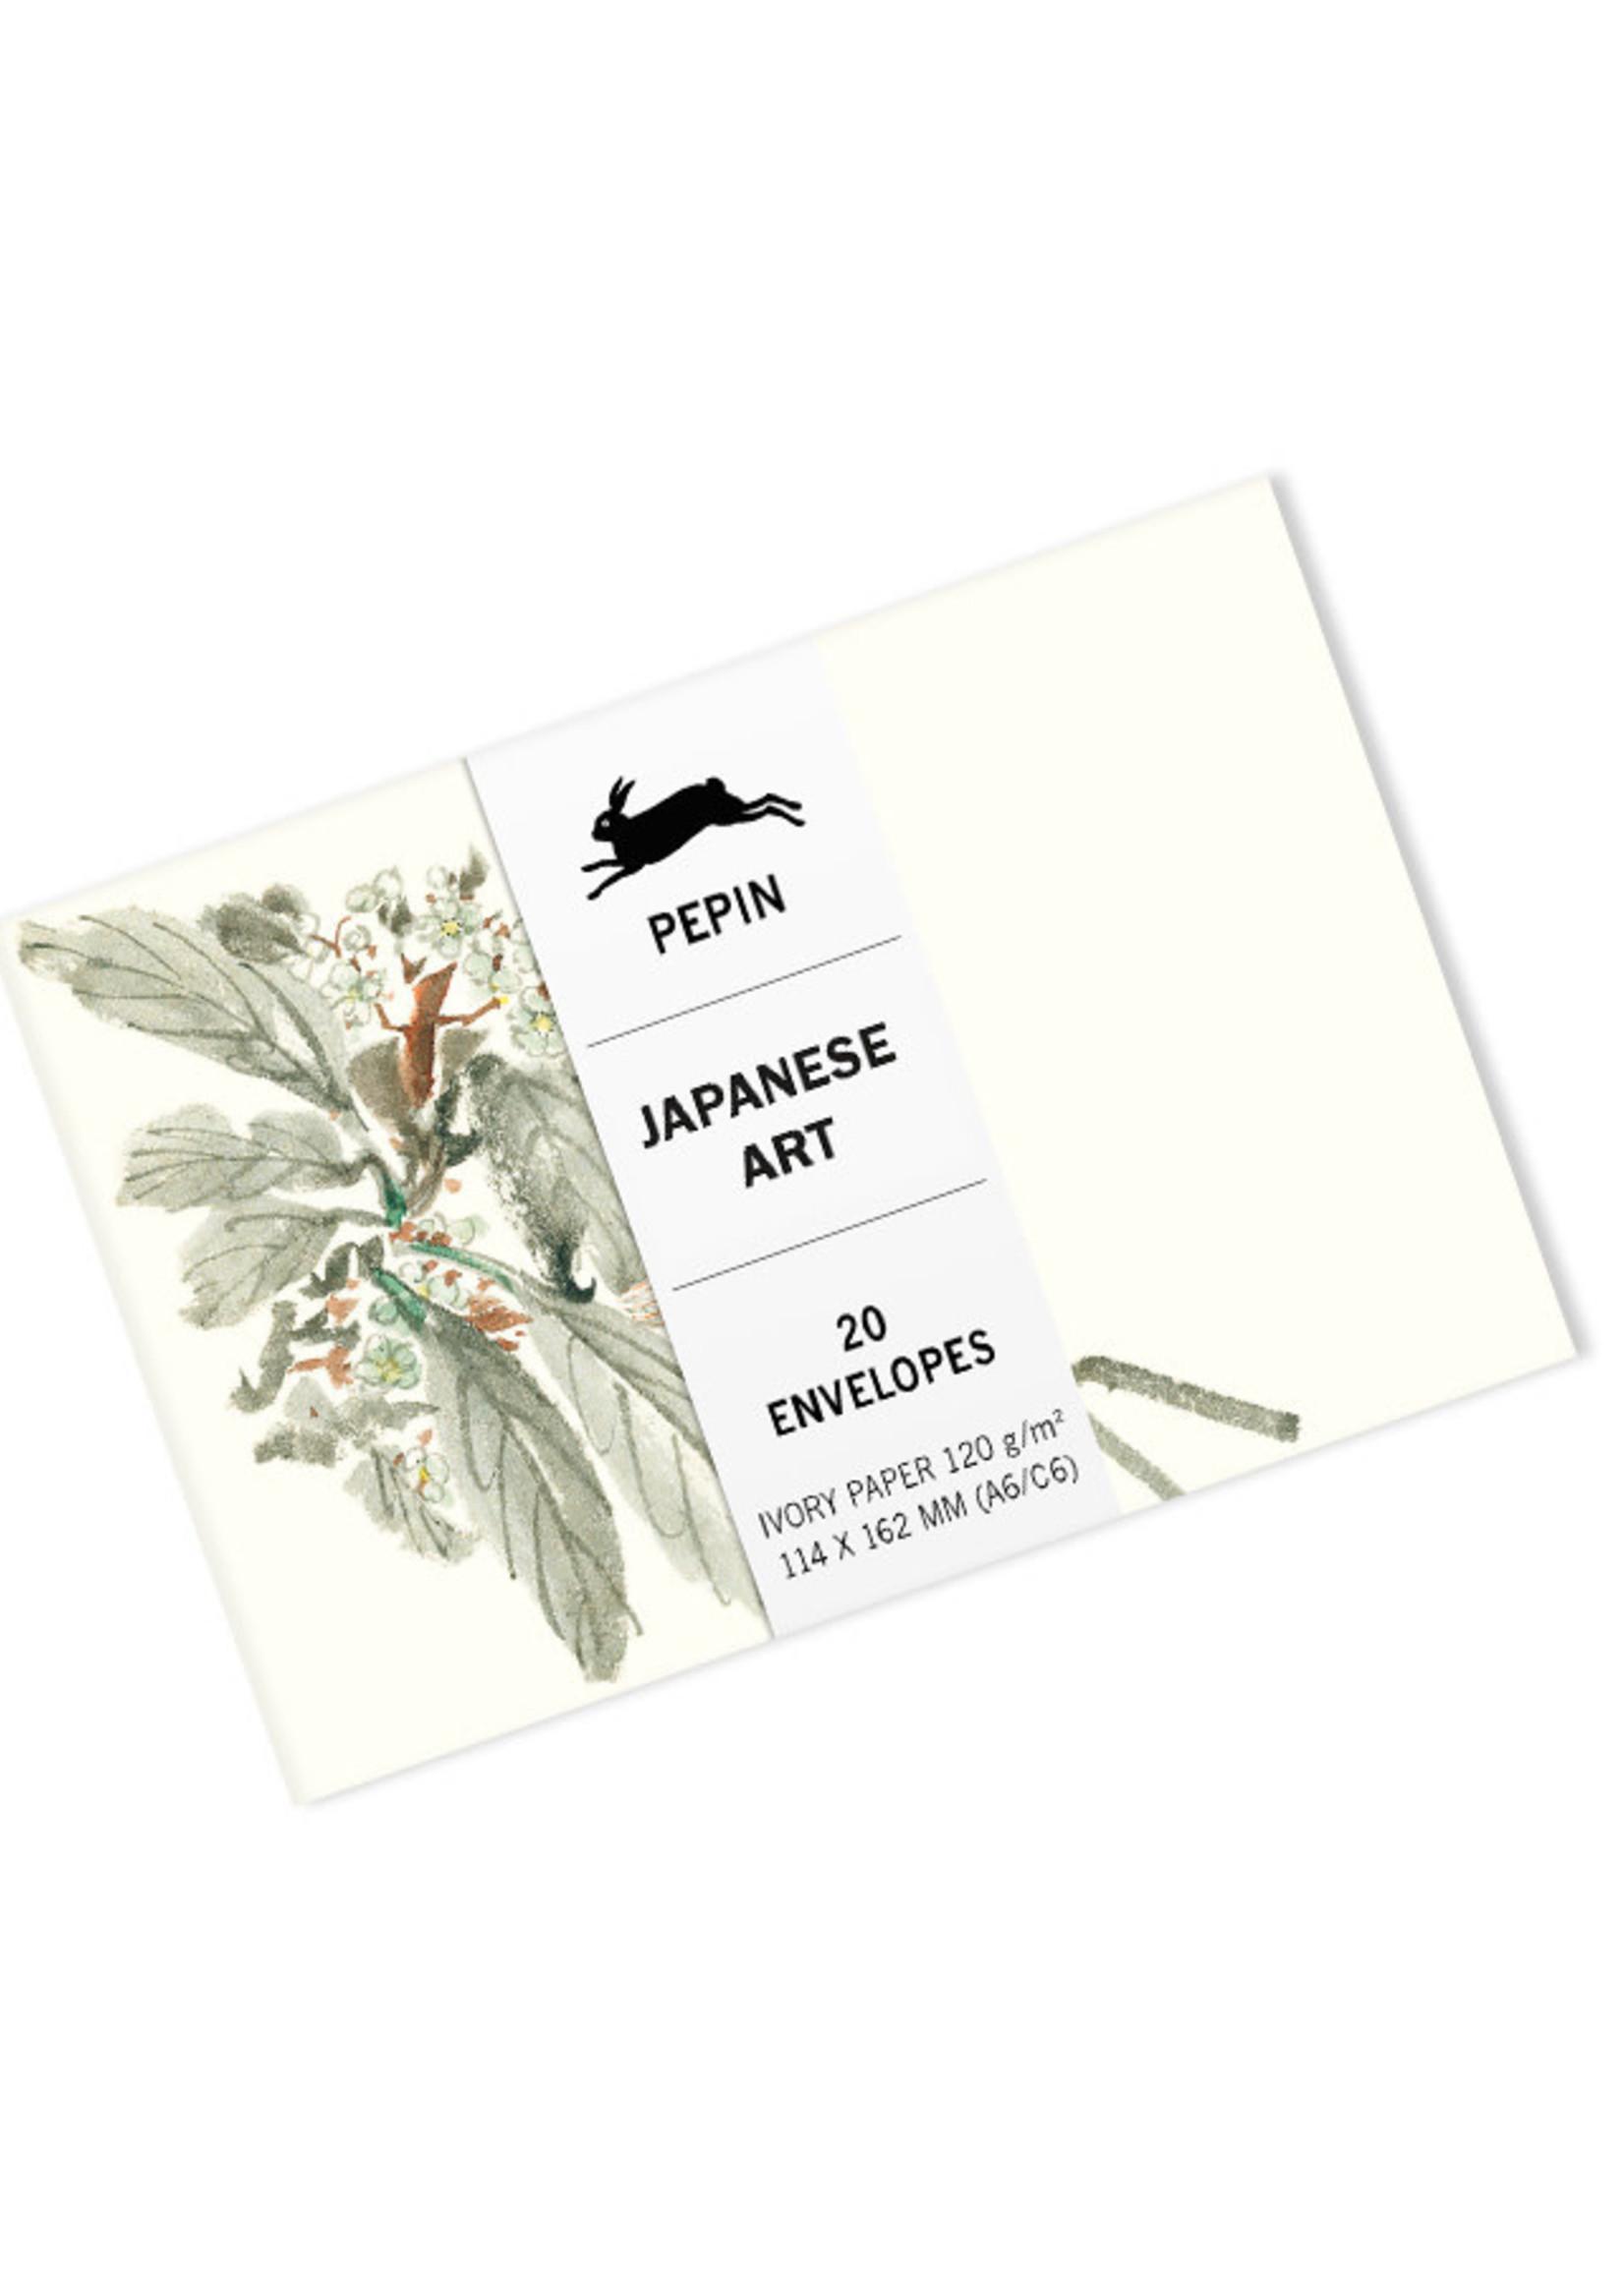 Pepin Press Enveloppen set van 20 stuks JAPANESE ART